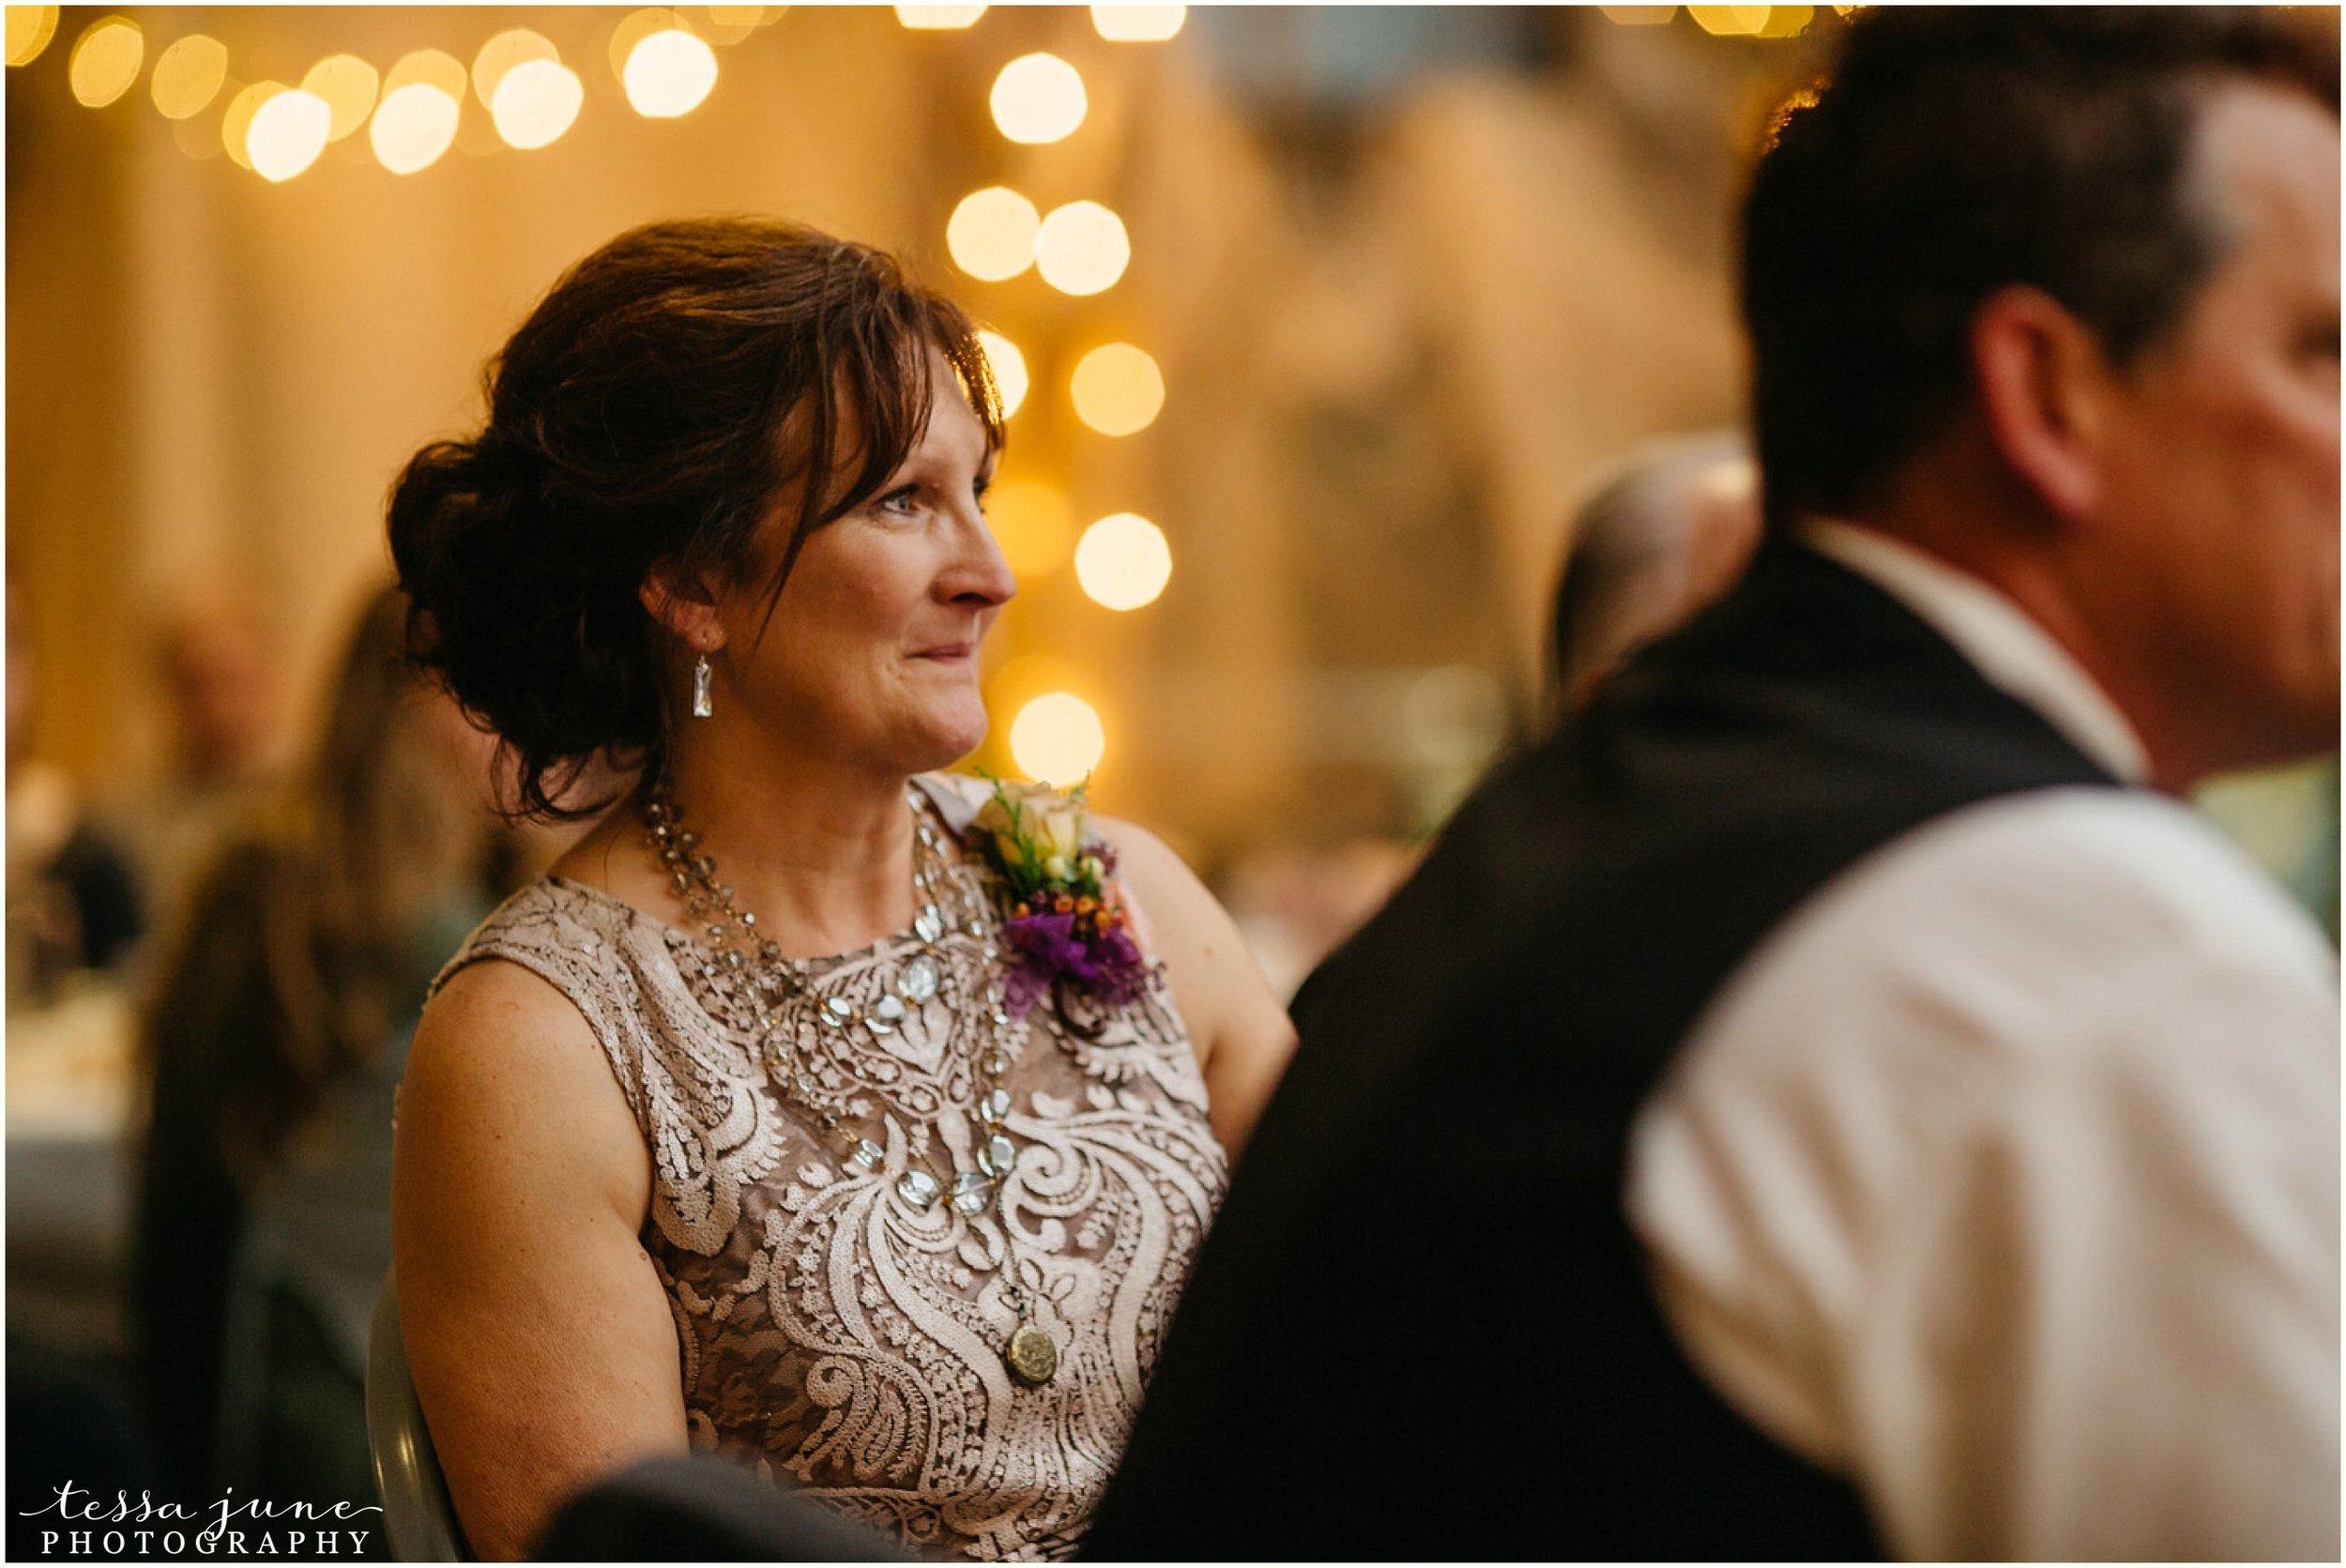 bohemian-minnesota-wedding-mismatched-bridesmaid-dresses-waterfall-st-cloud-tessa-june-photography-171.jpg